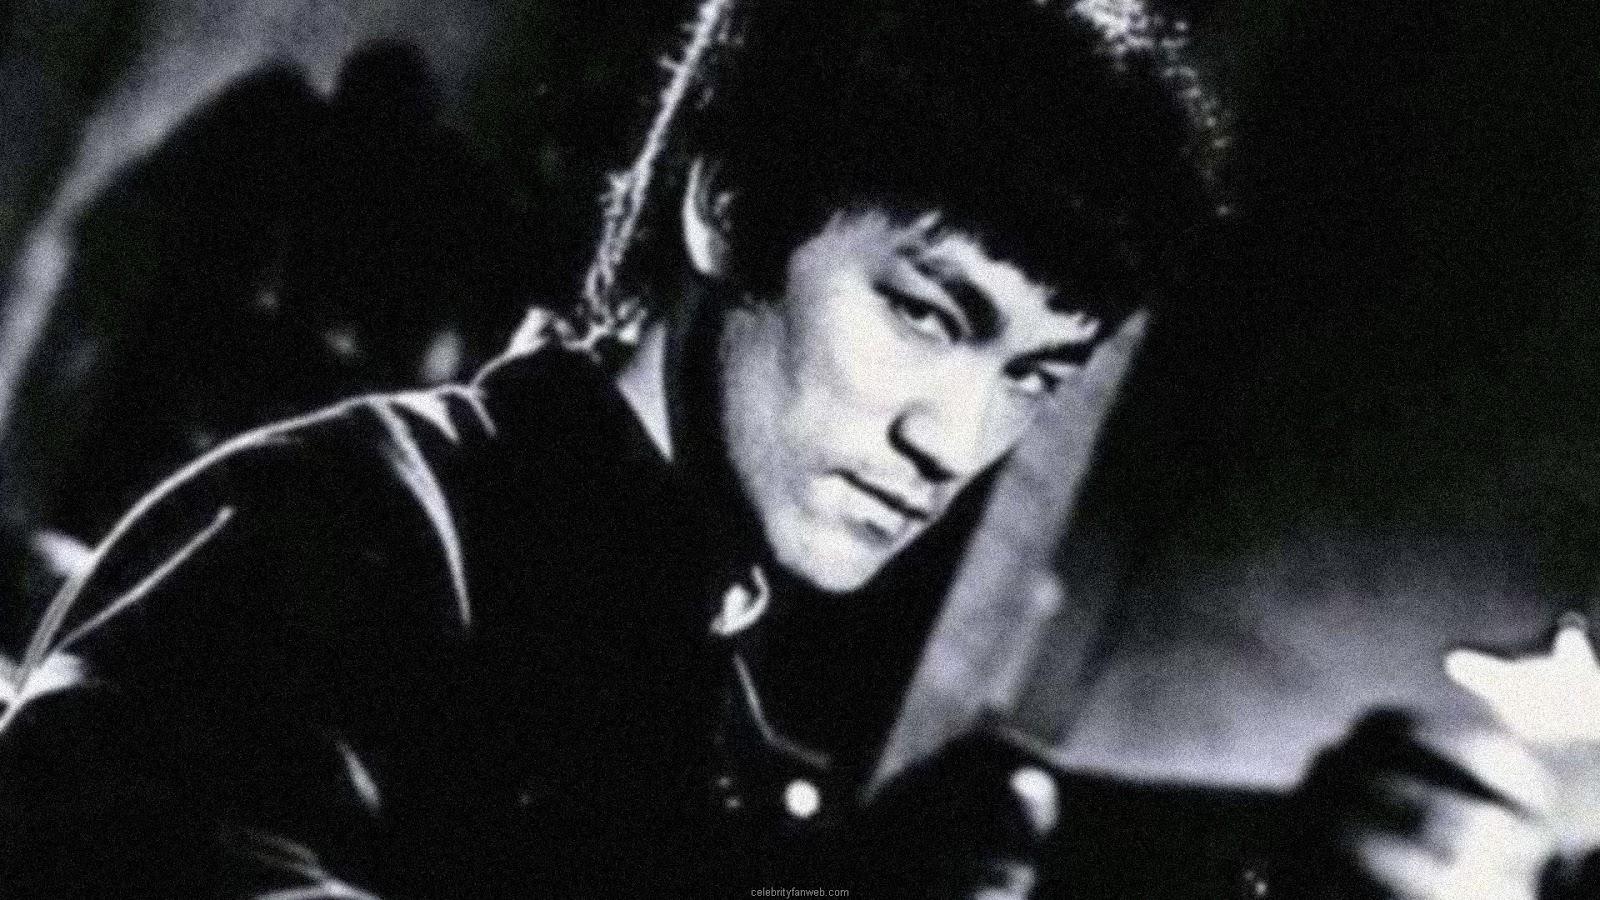 http://1.bp.blogspot.com/-e1-BlWZqKhA/TujrofQsUYI/AAAAAAAAB3A/MI8nd48-h3c/s1600/Bruce+Lee+Wallpapers+54.jpg